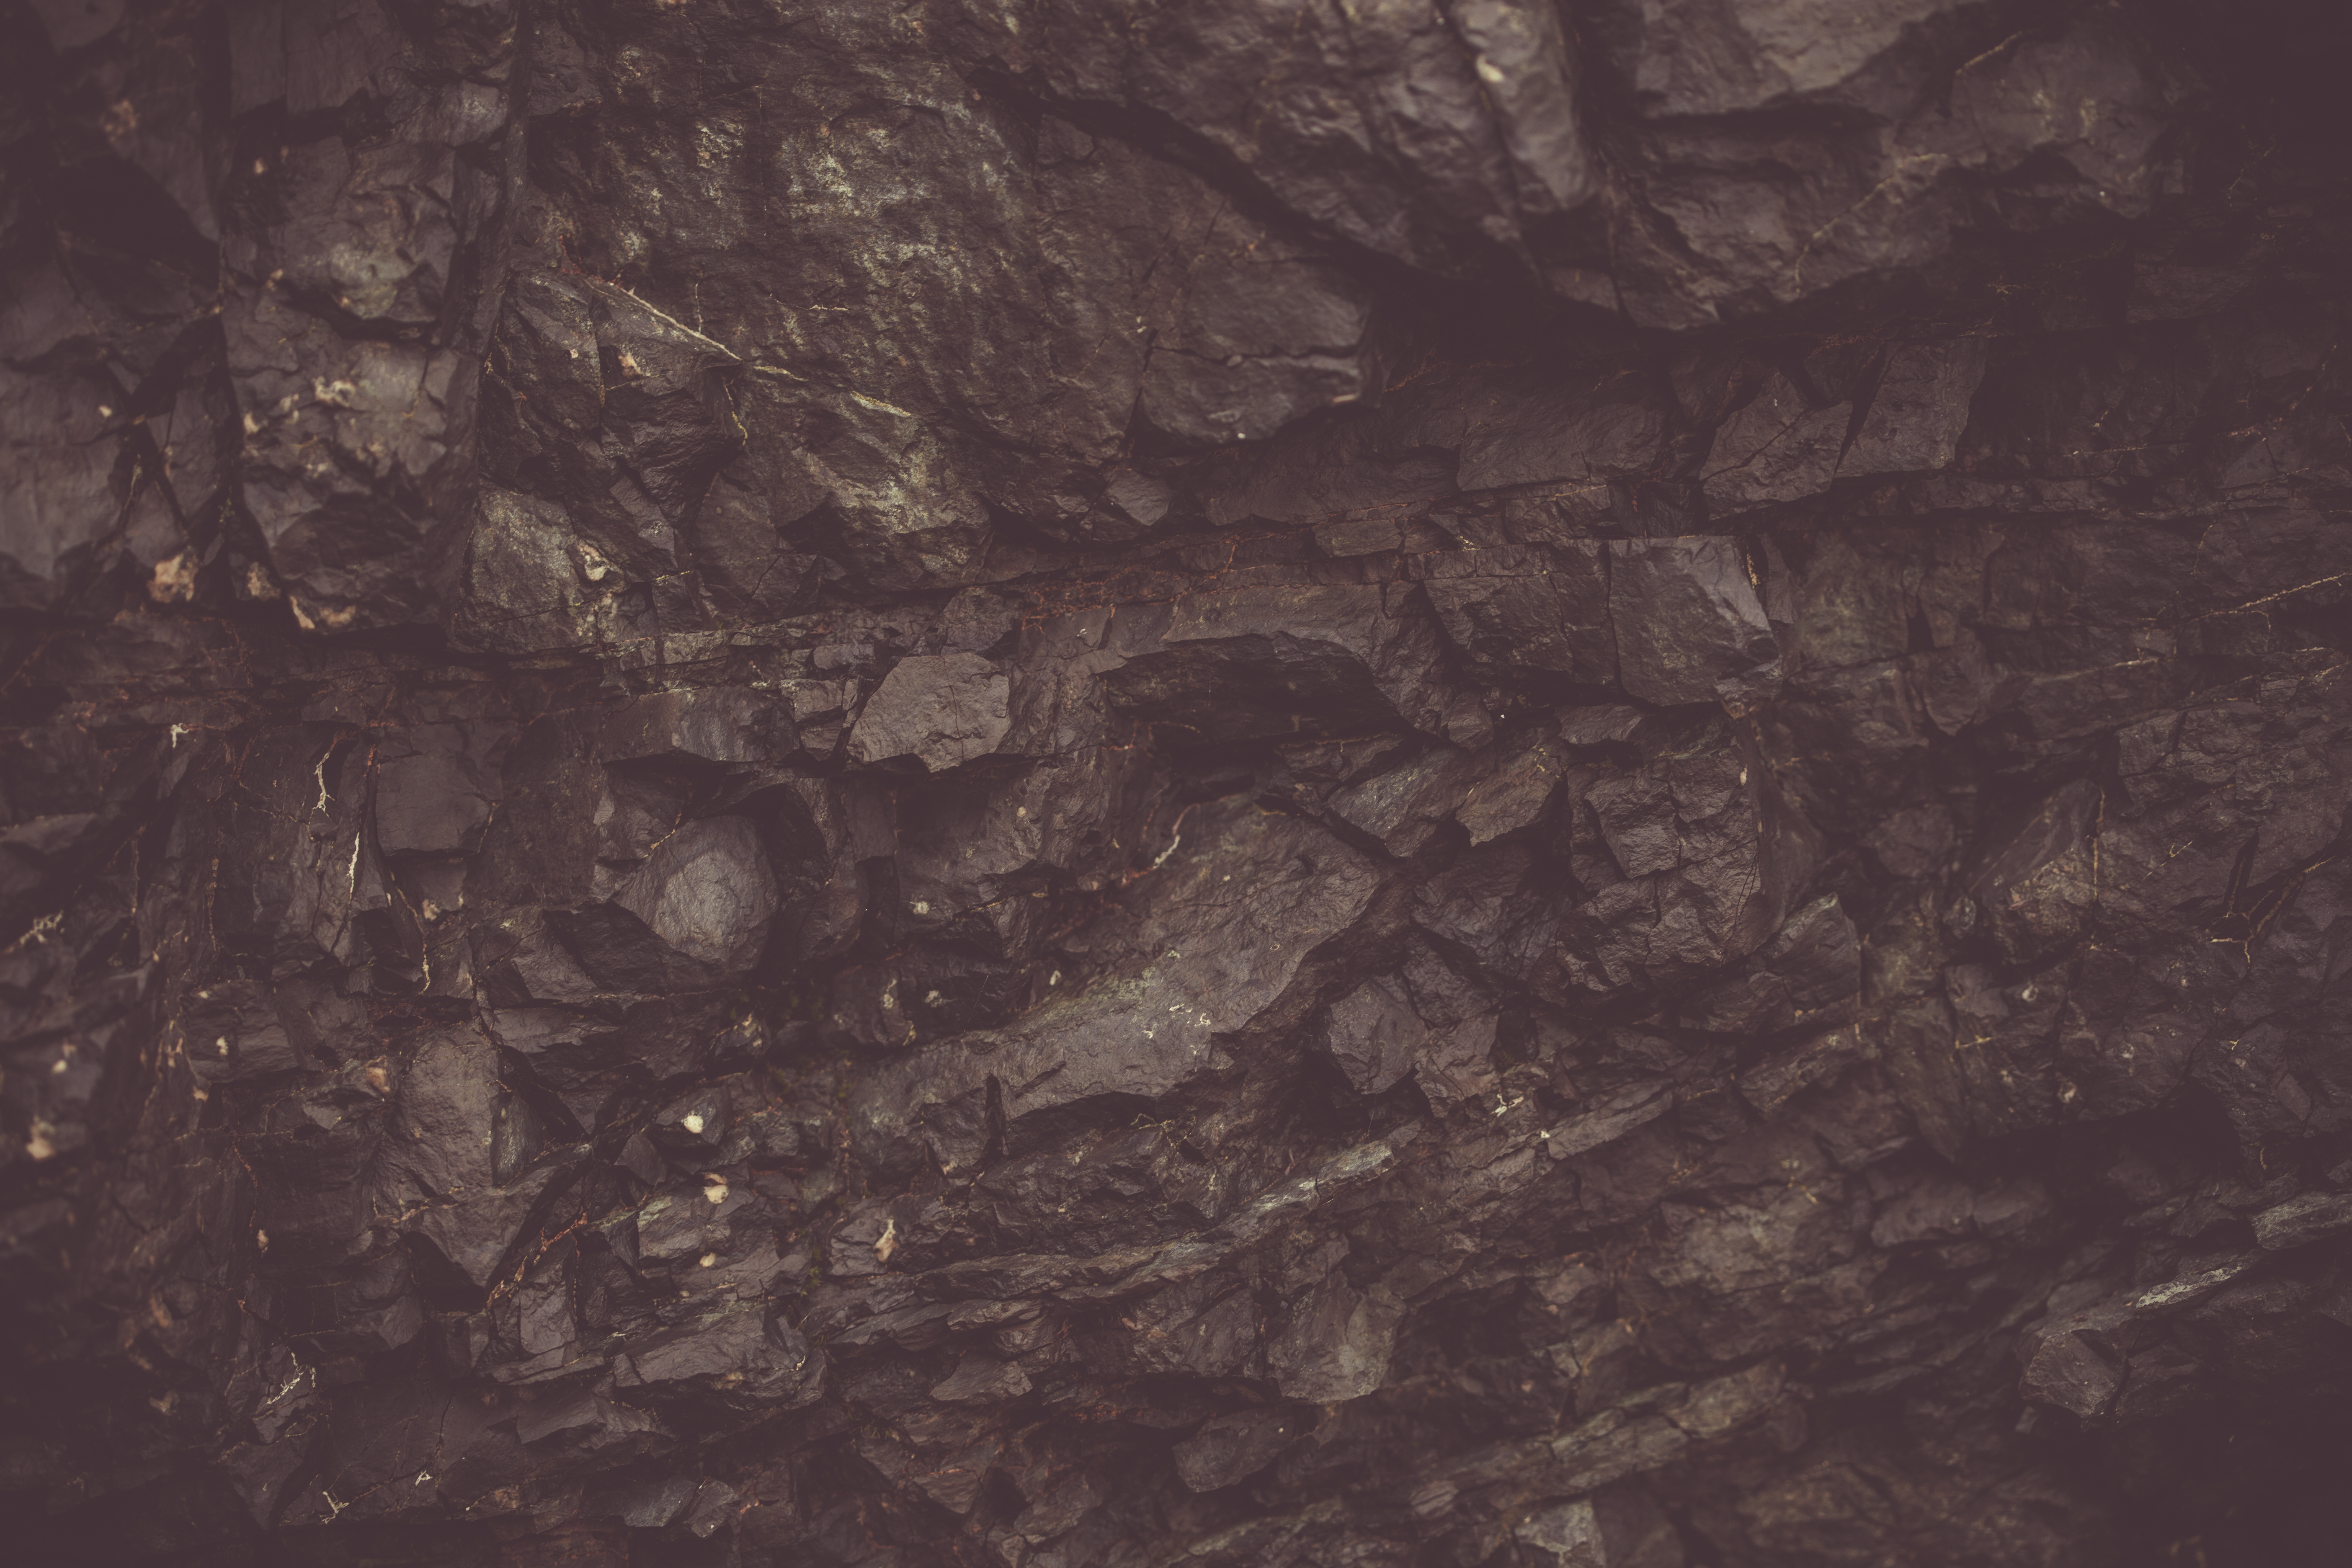 Vintage basalt rock texture photo